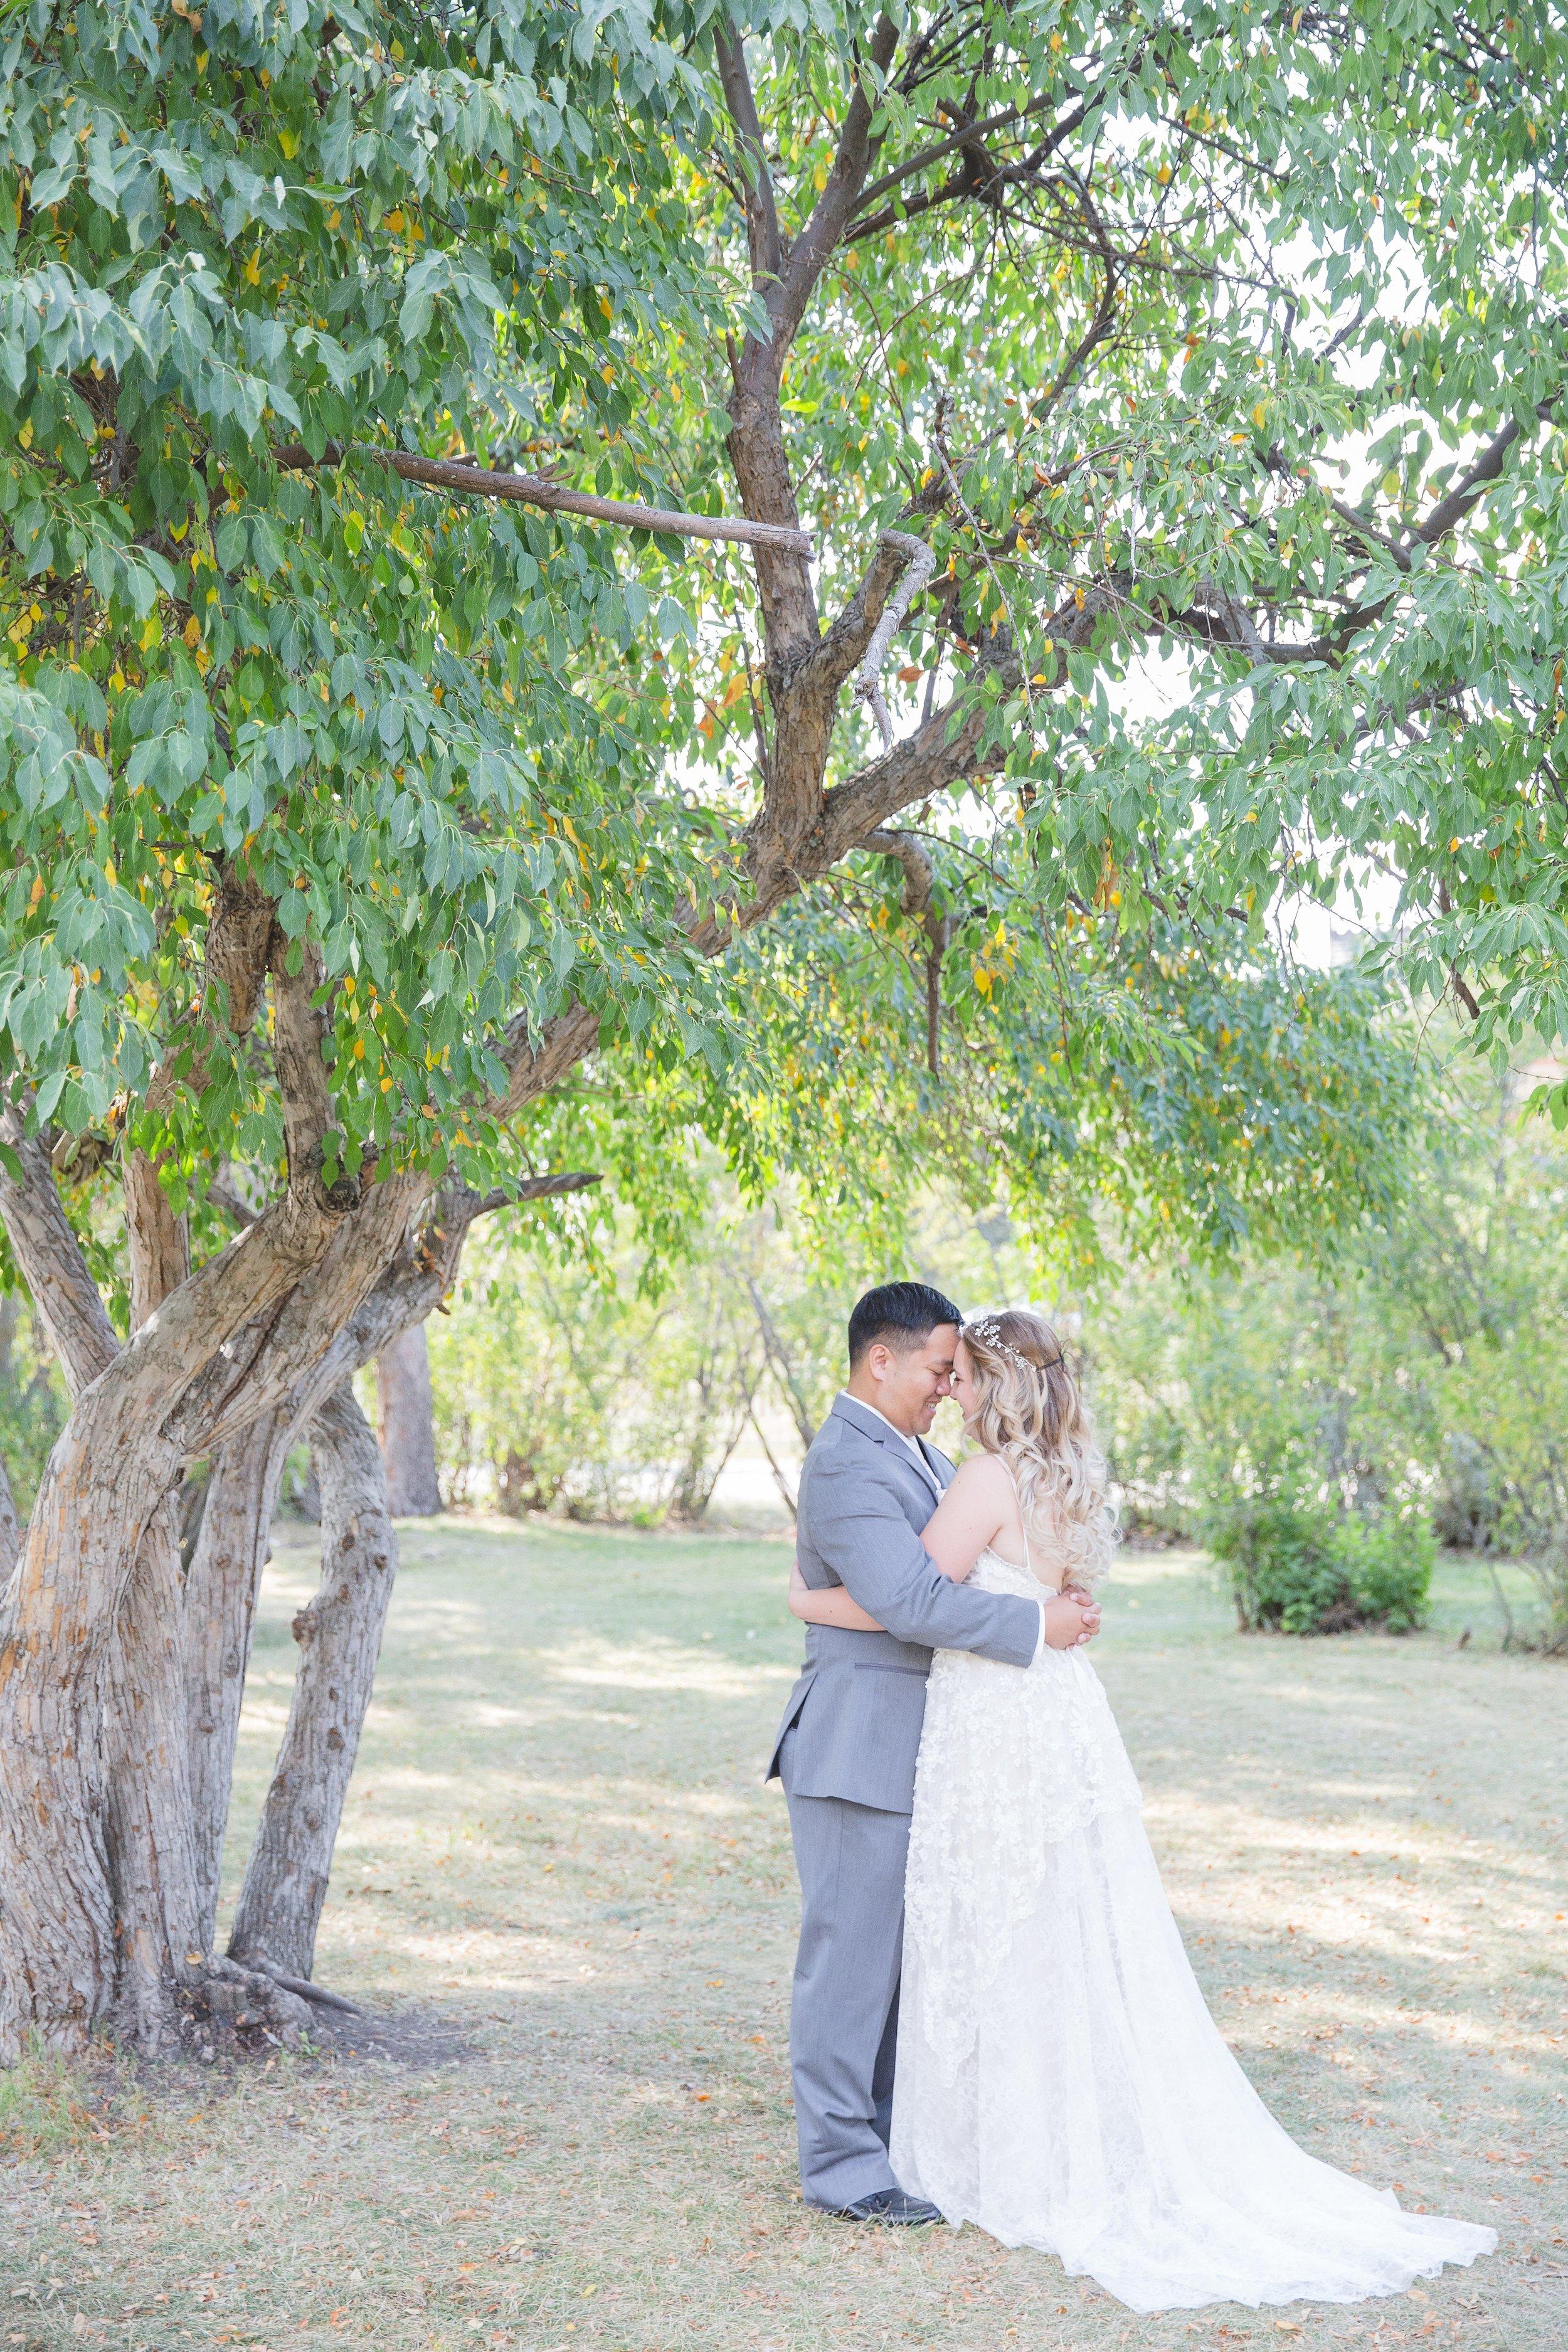 Calgary Wedding Photography at Bow Valley Ranche